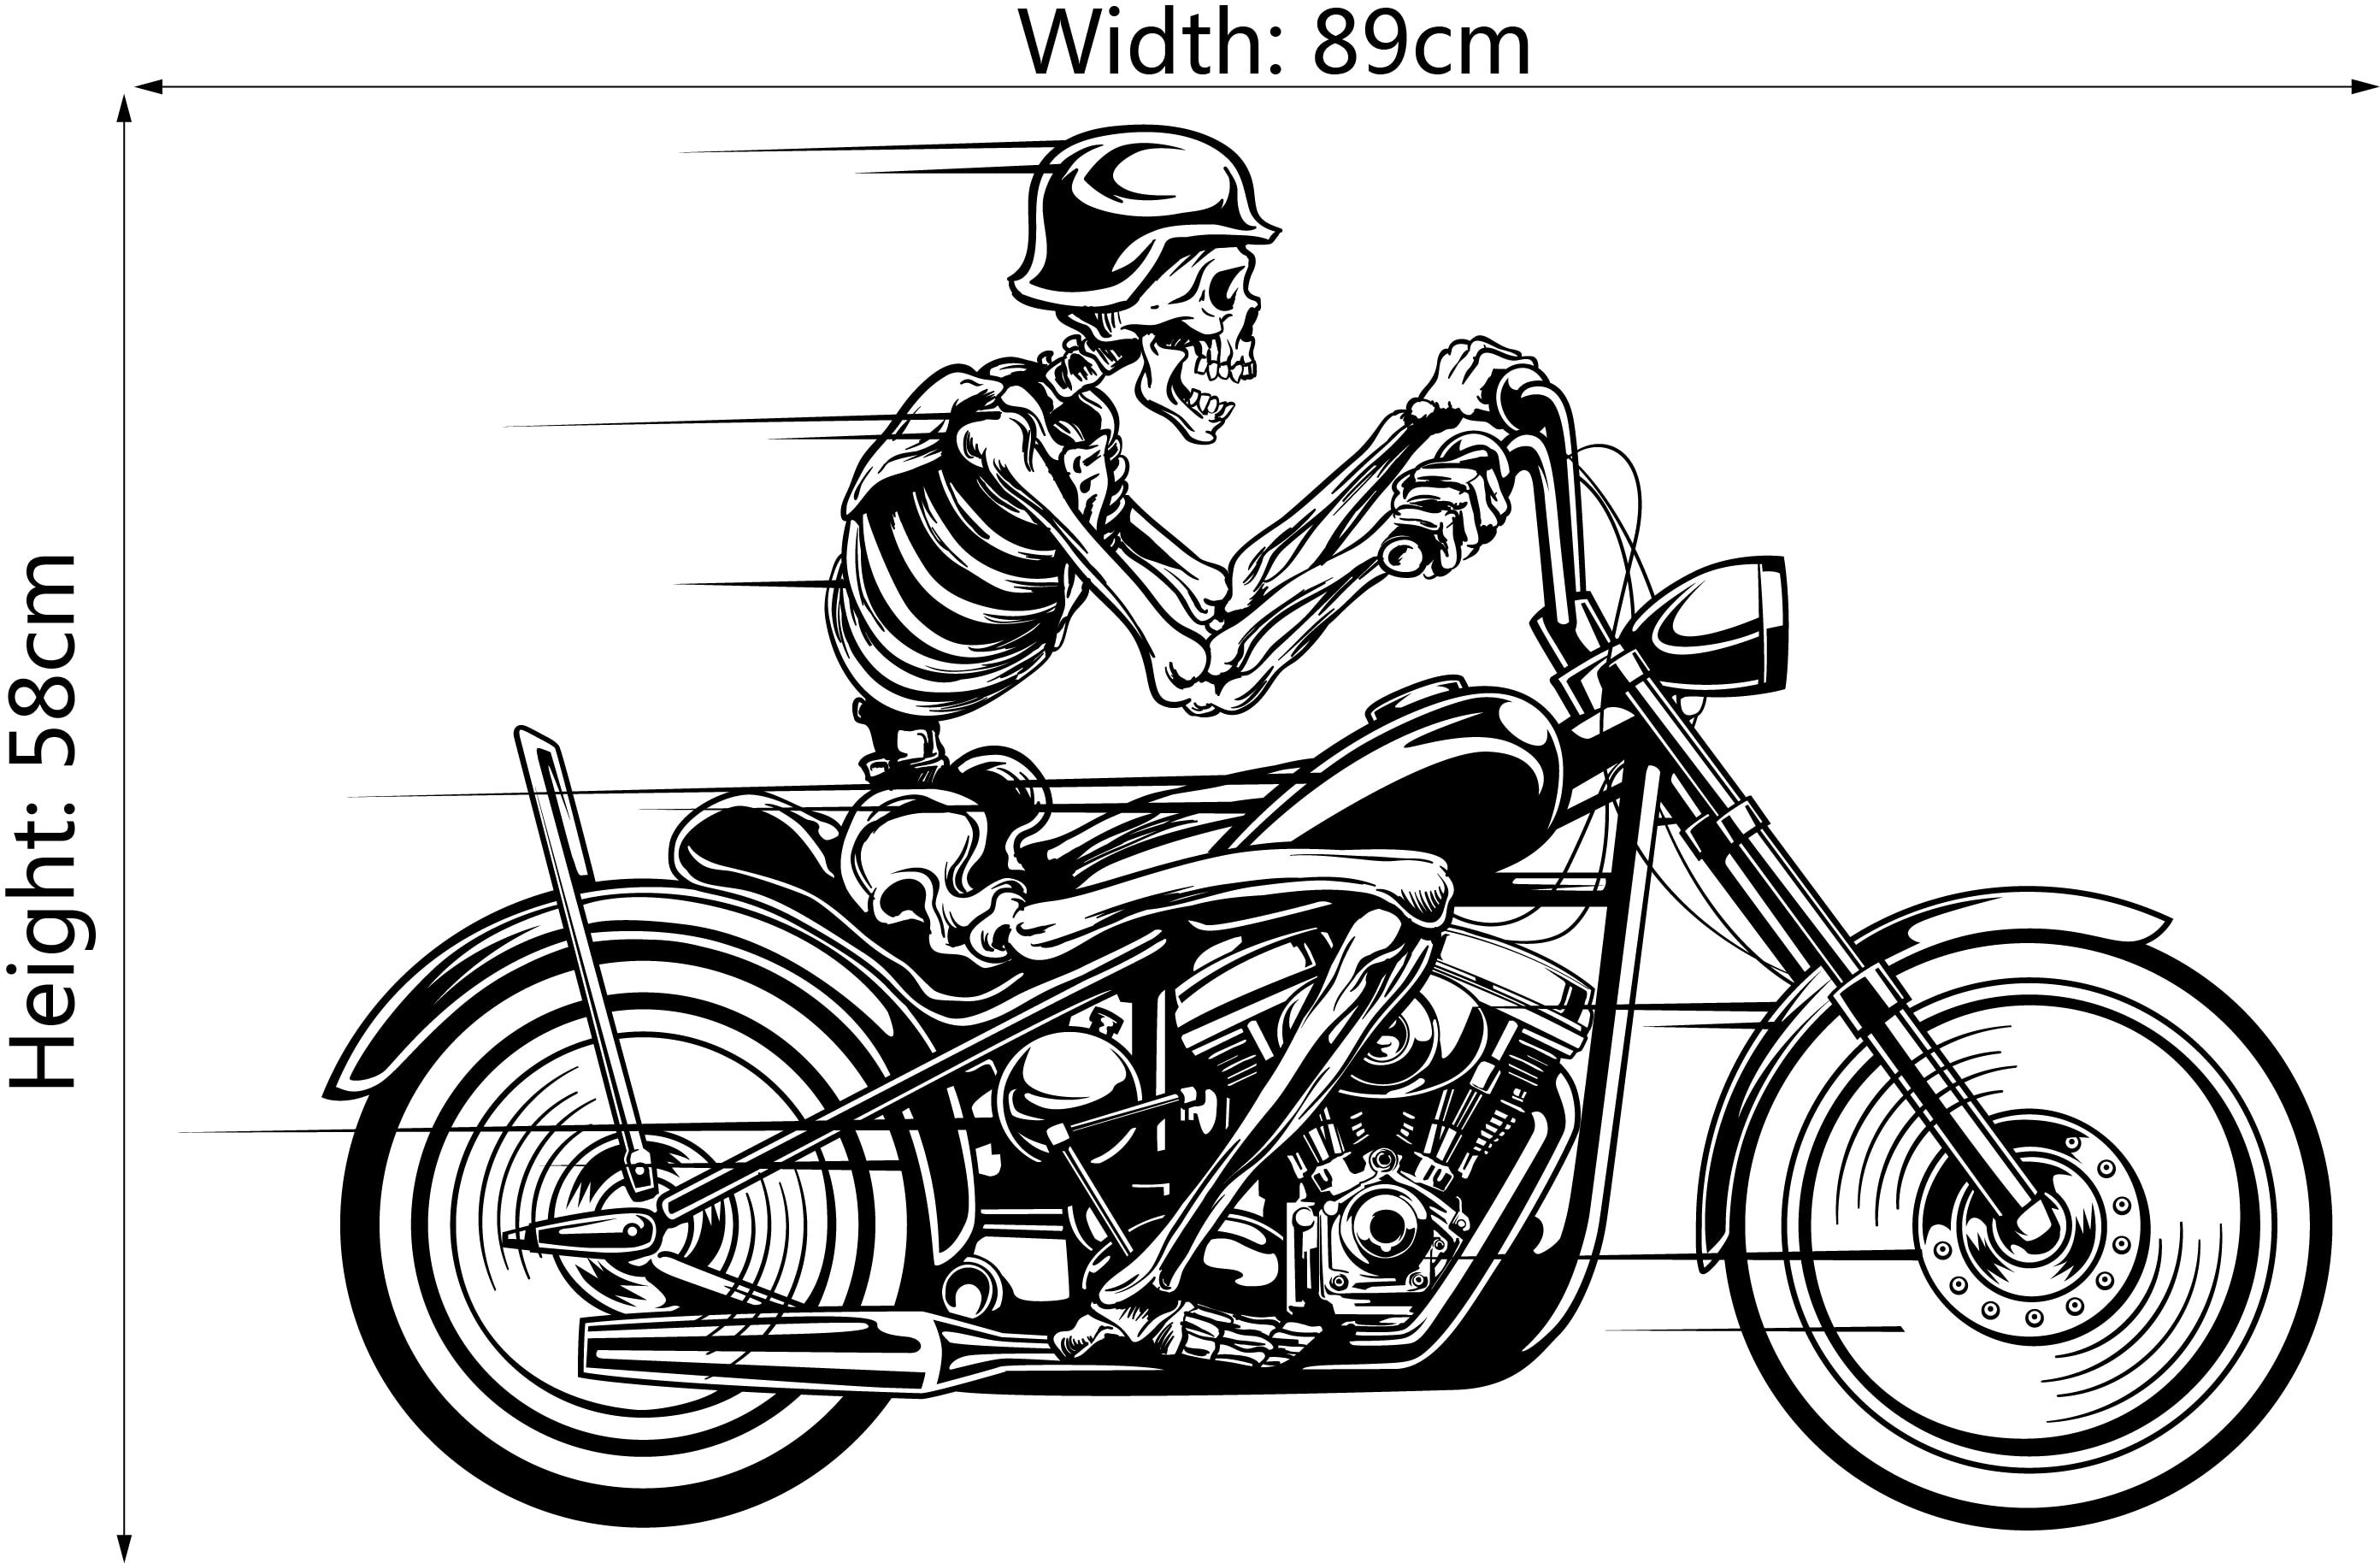 DSU Skeleton Ride A Motorcycle Simple Speeding Art Wall Stickers ... 82c4f4d9d349